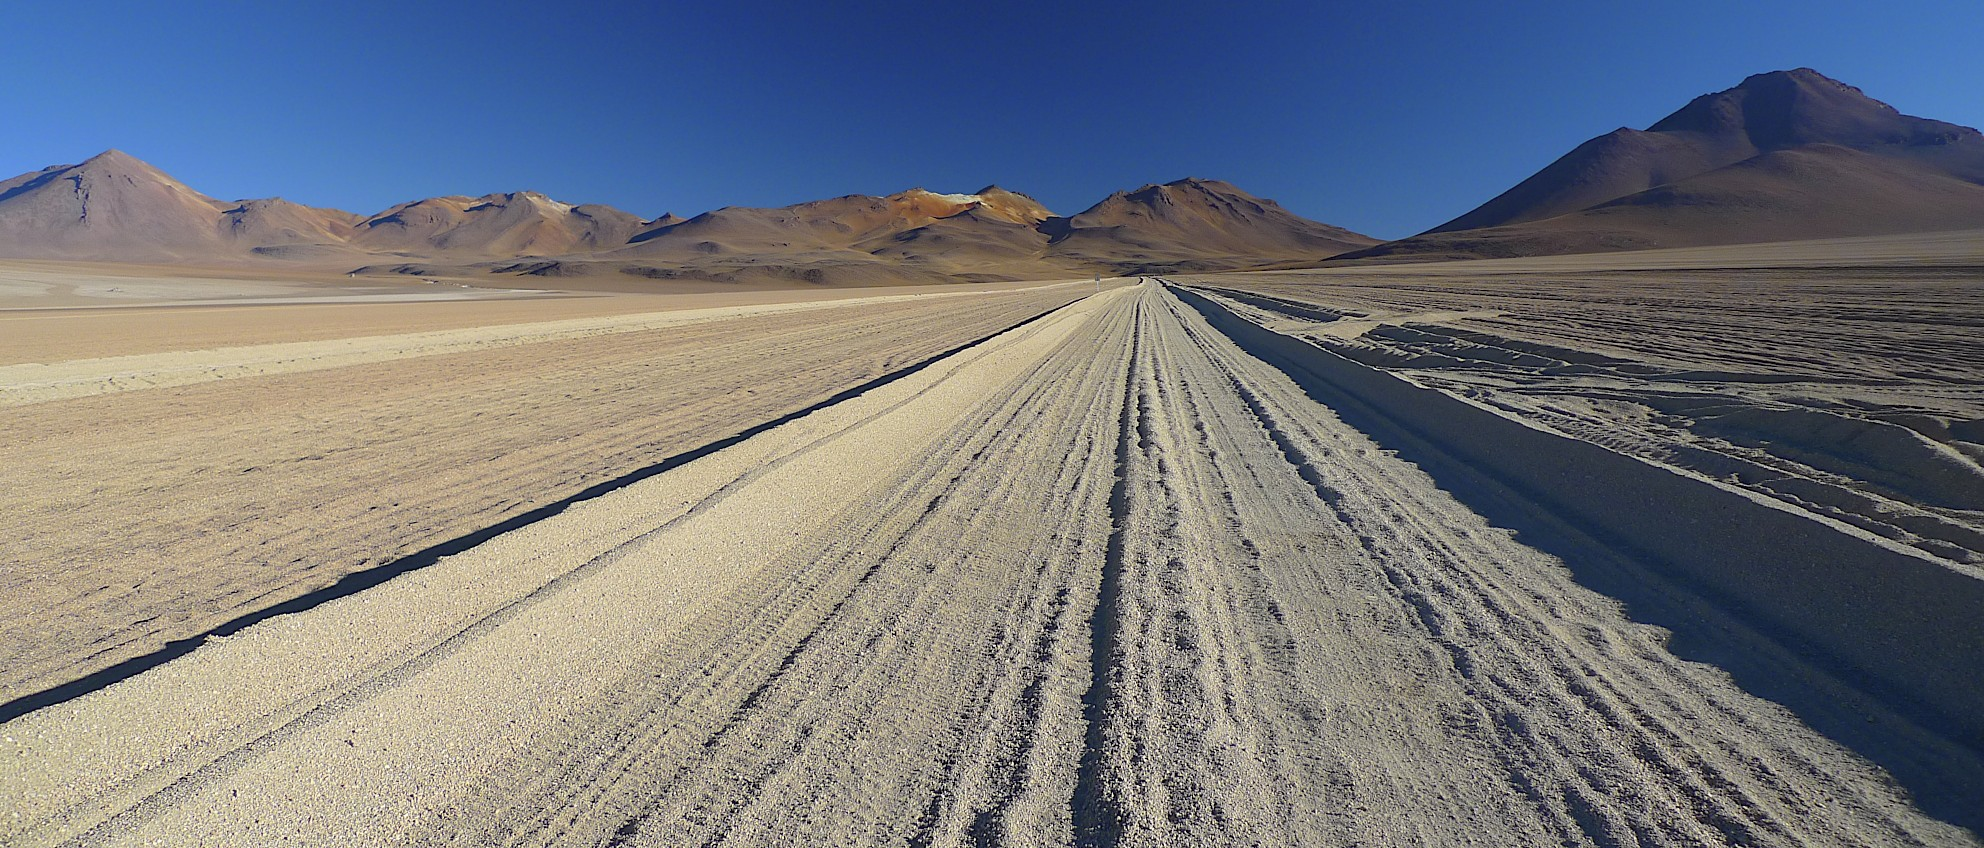 The roads of the high Atacama